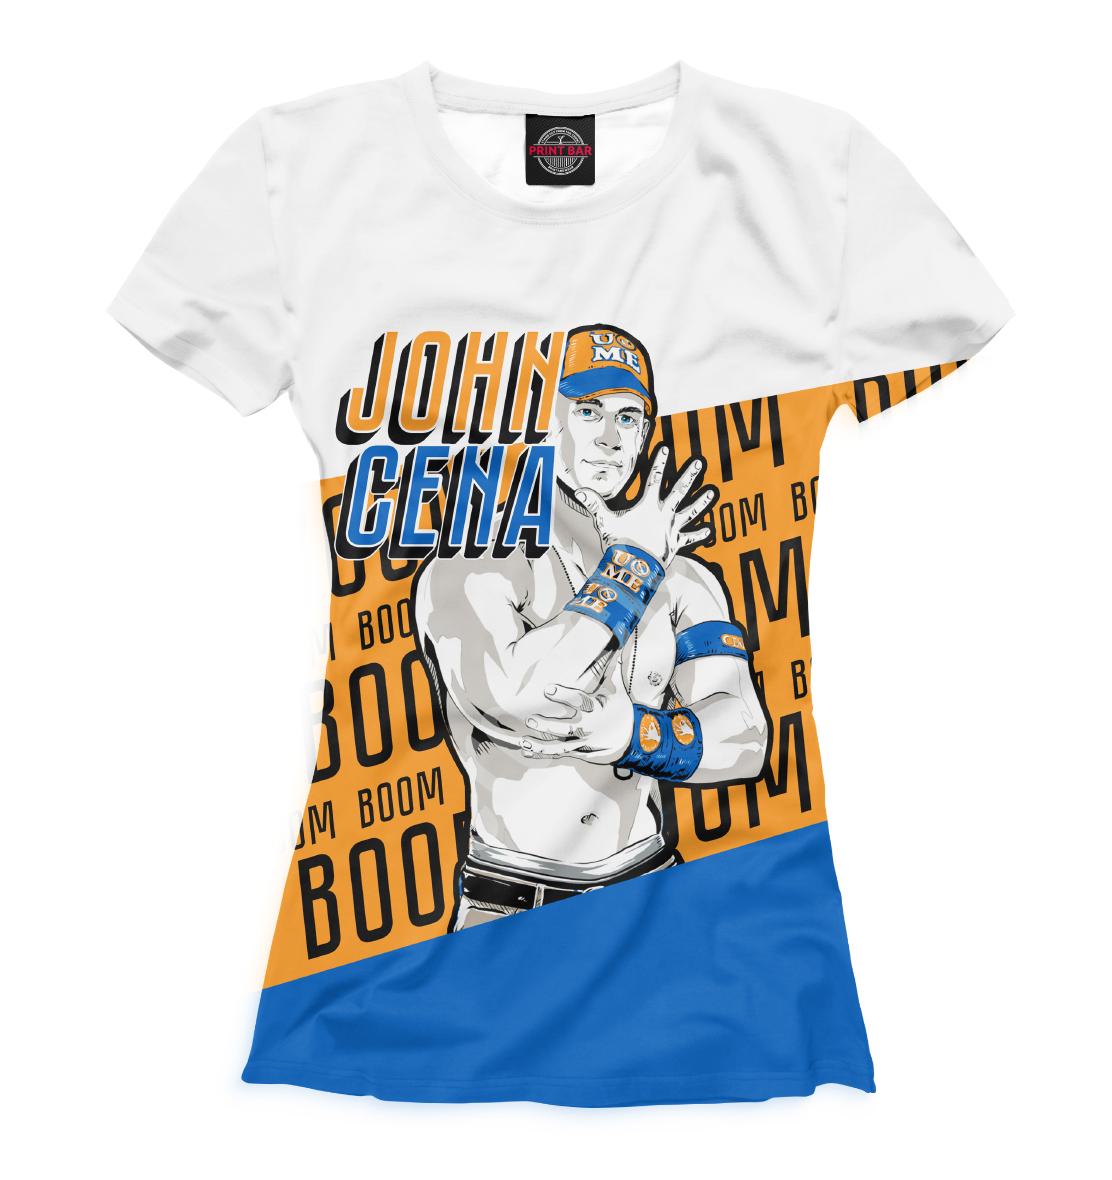 Купить Джон Сина, Printbar, Футболки, WWE-756835-fut-1